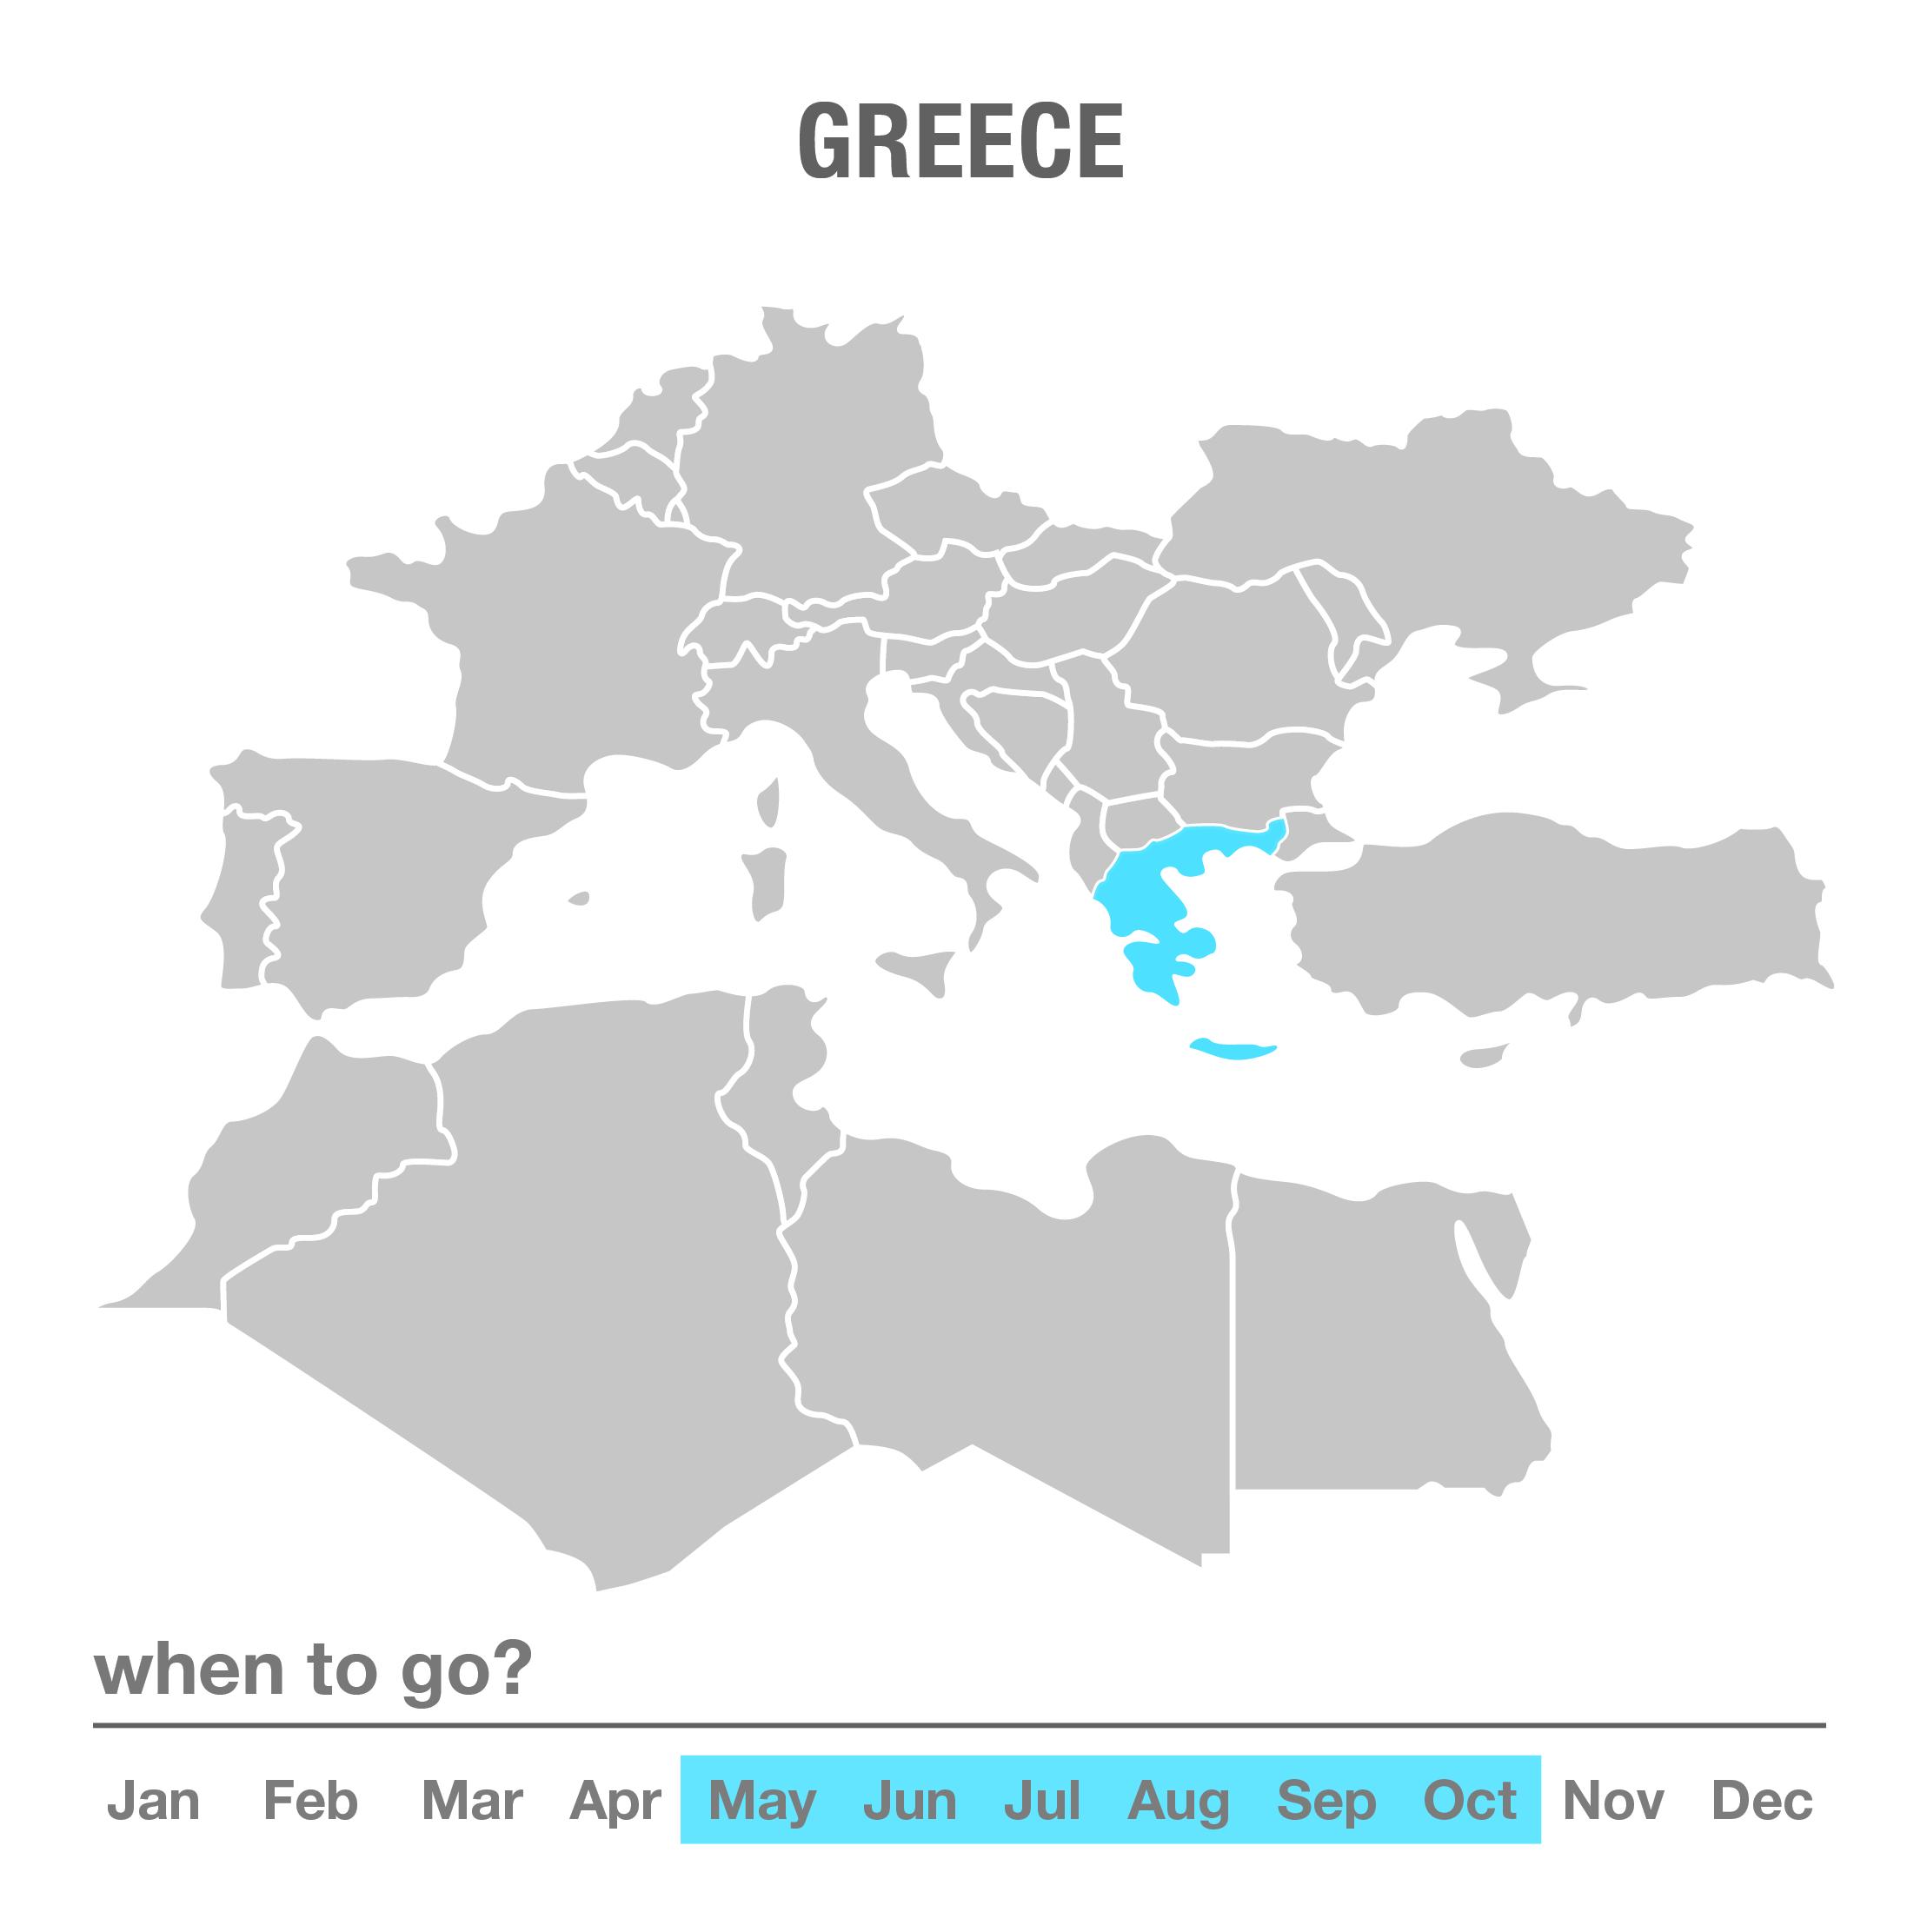 Luxury Tours Greece